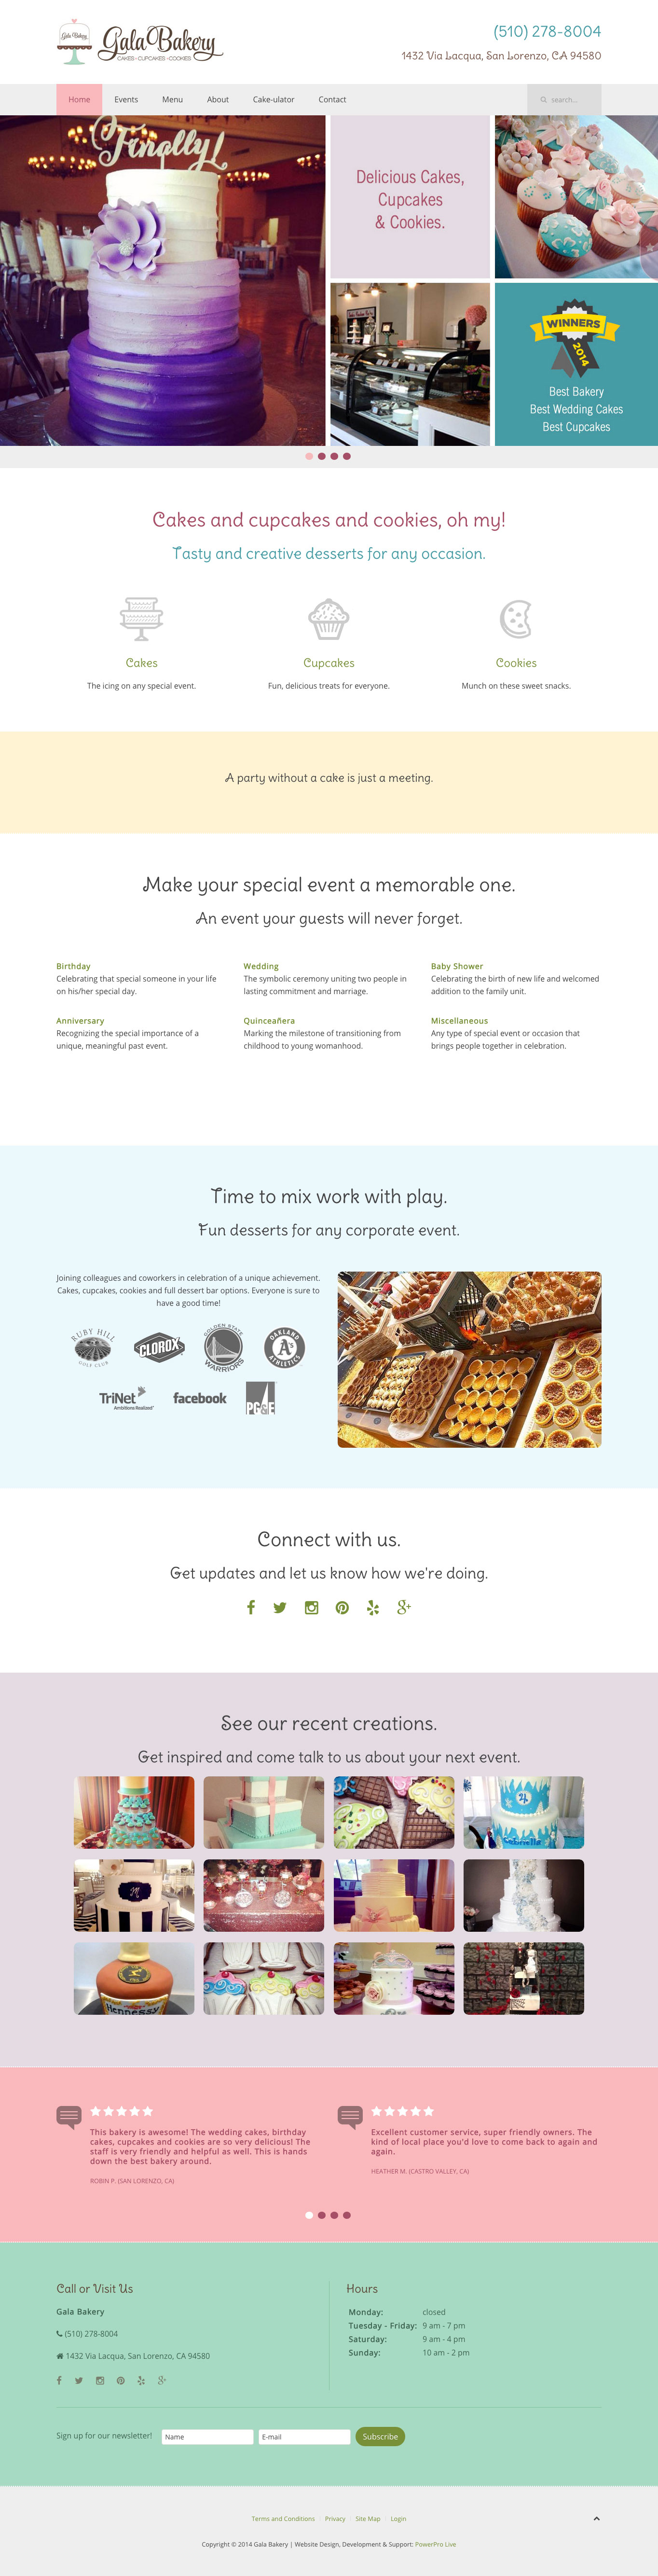 gala-bakery-website